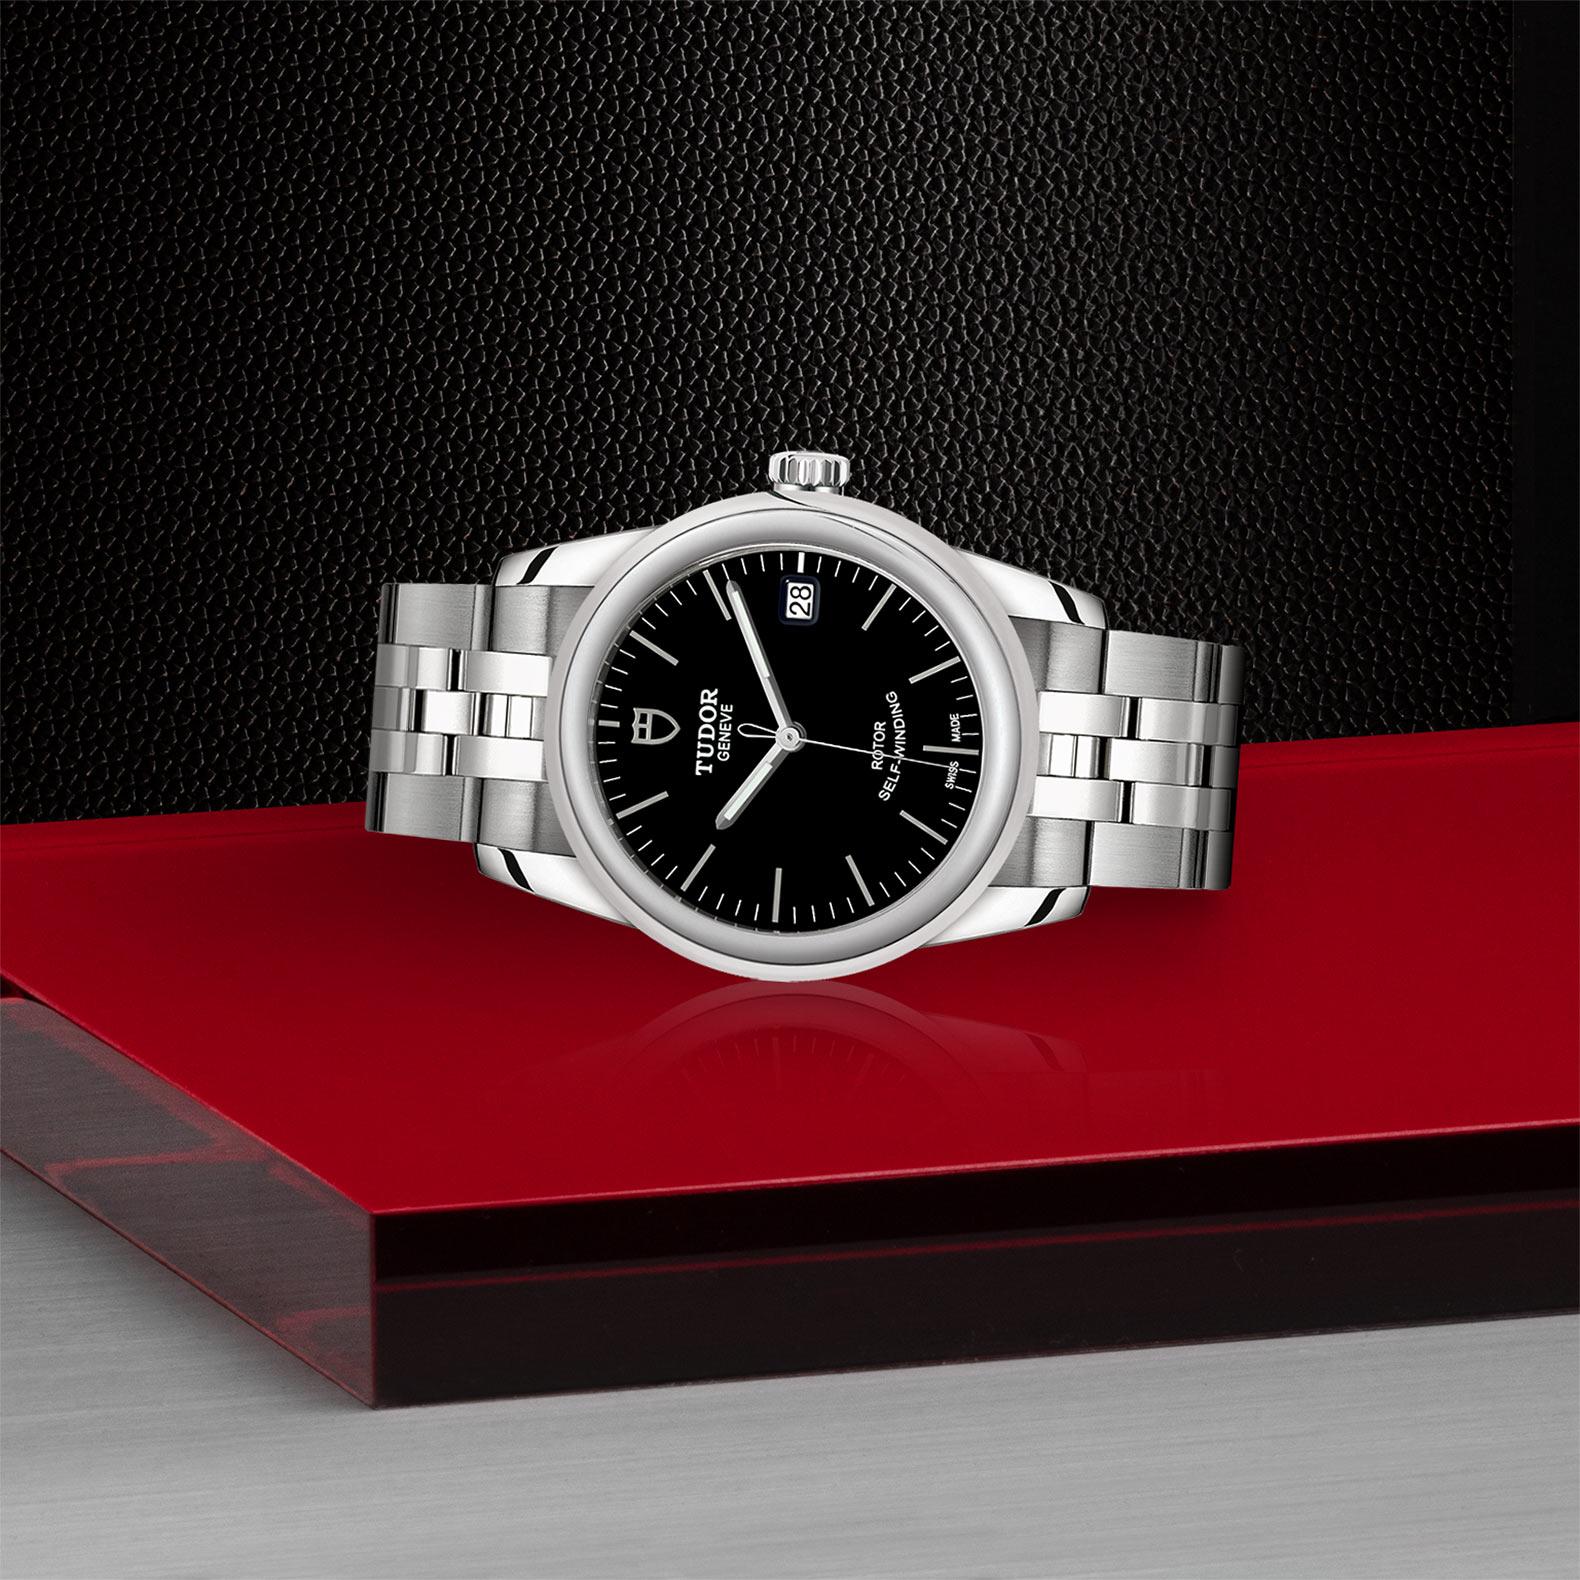 TUDOR Glamour Date - M55000-0007